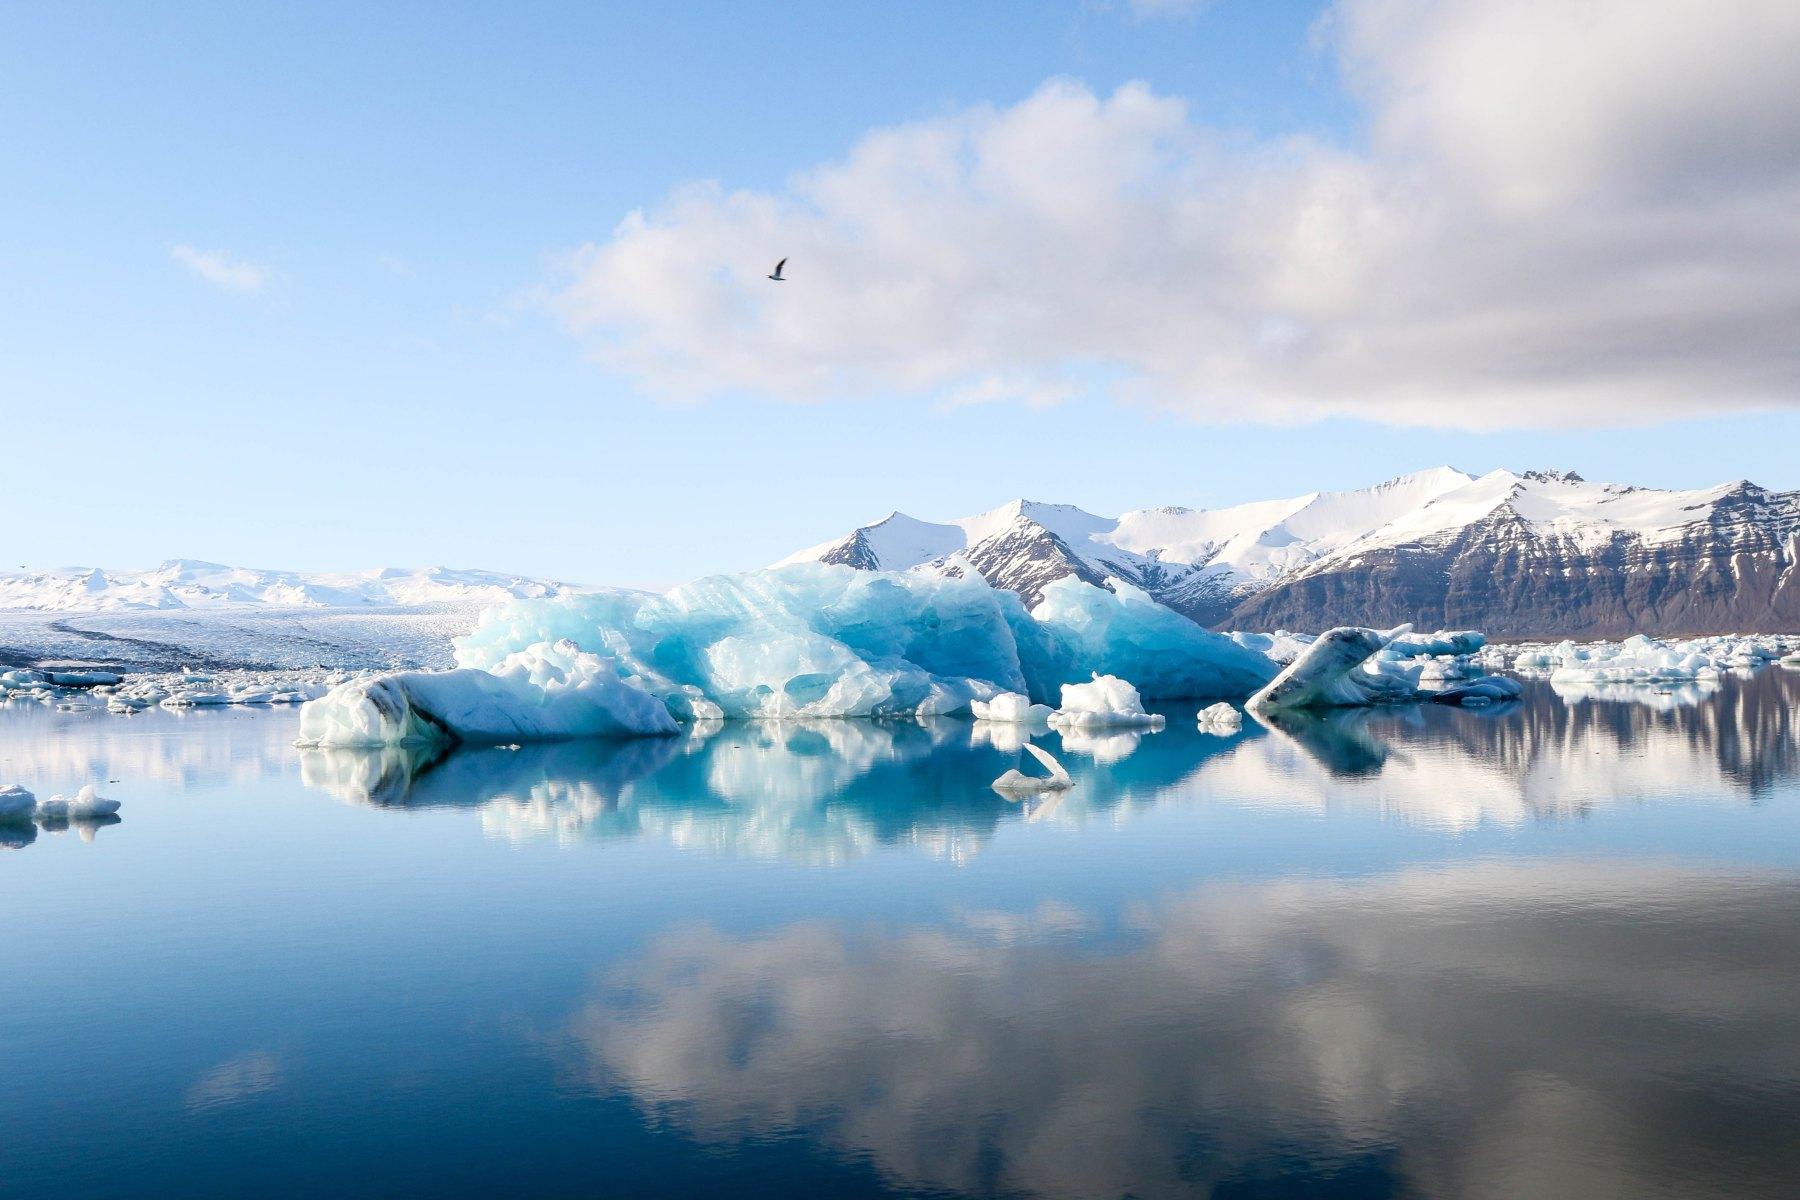 How to avoid the iceberg